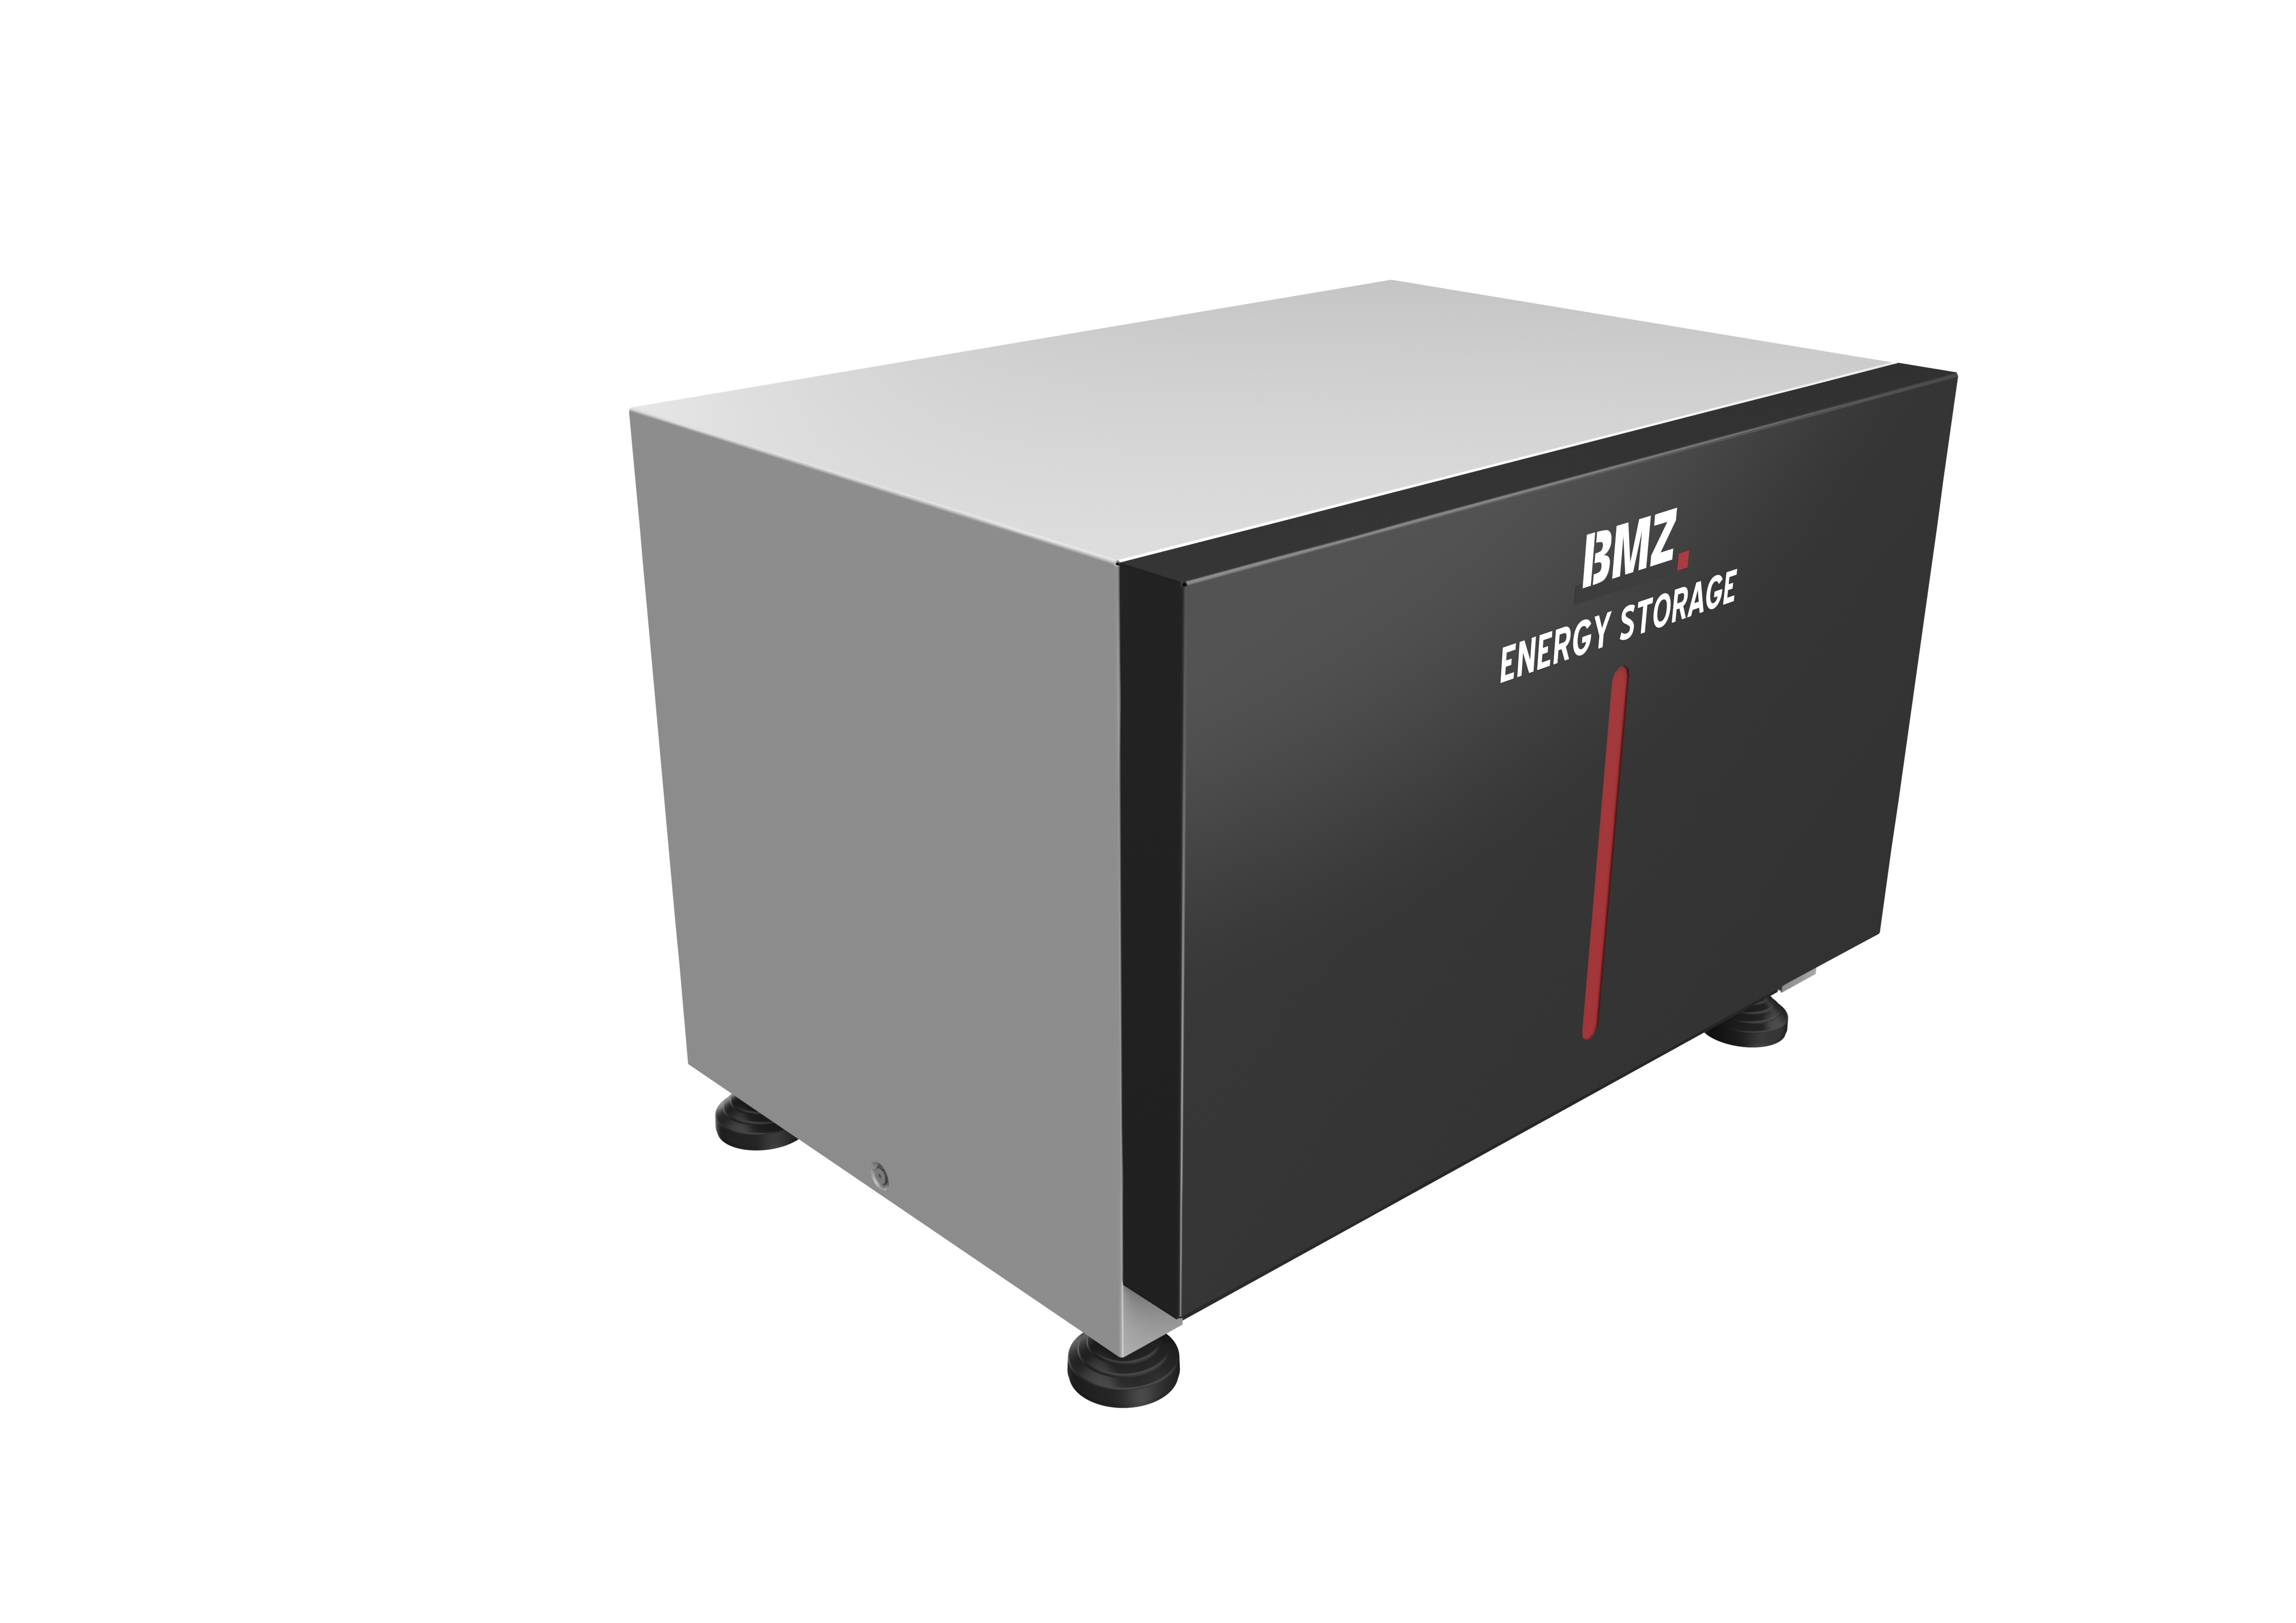 1 Stk BMZ Energiespeichersystem ESS 7.0 LiIon 5,4 kWh nutzbar PVES0007--